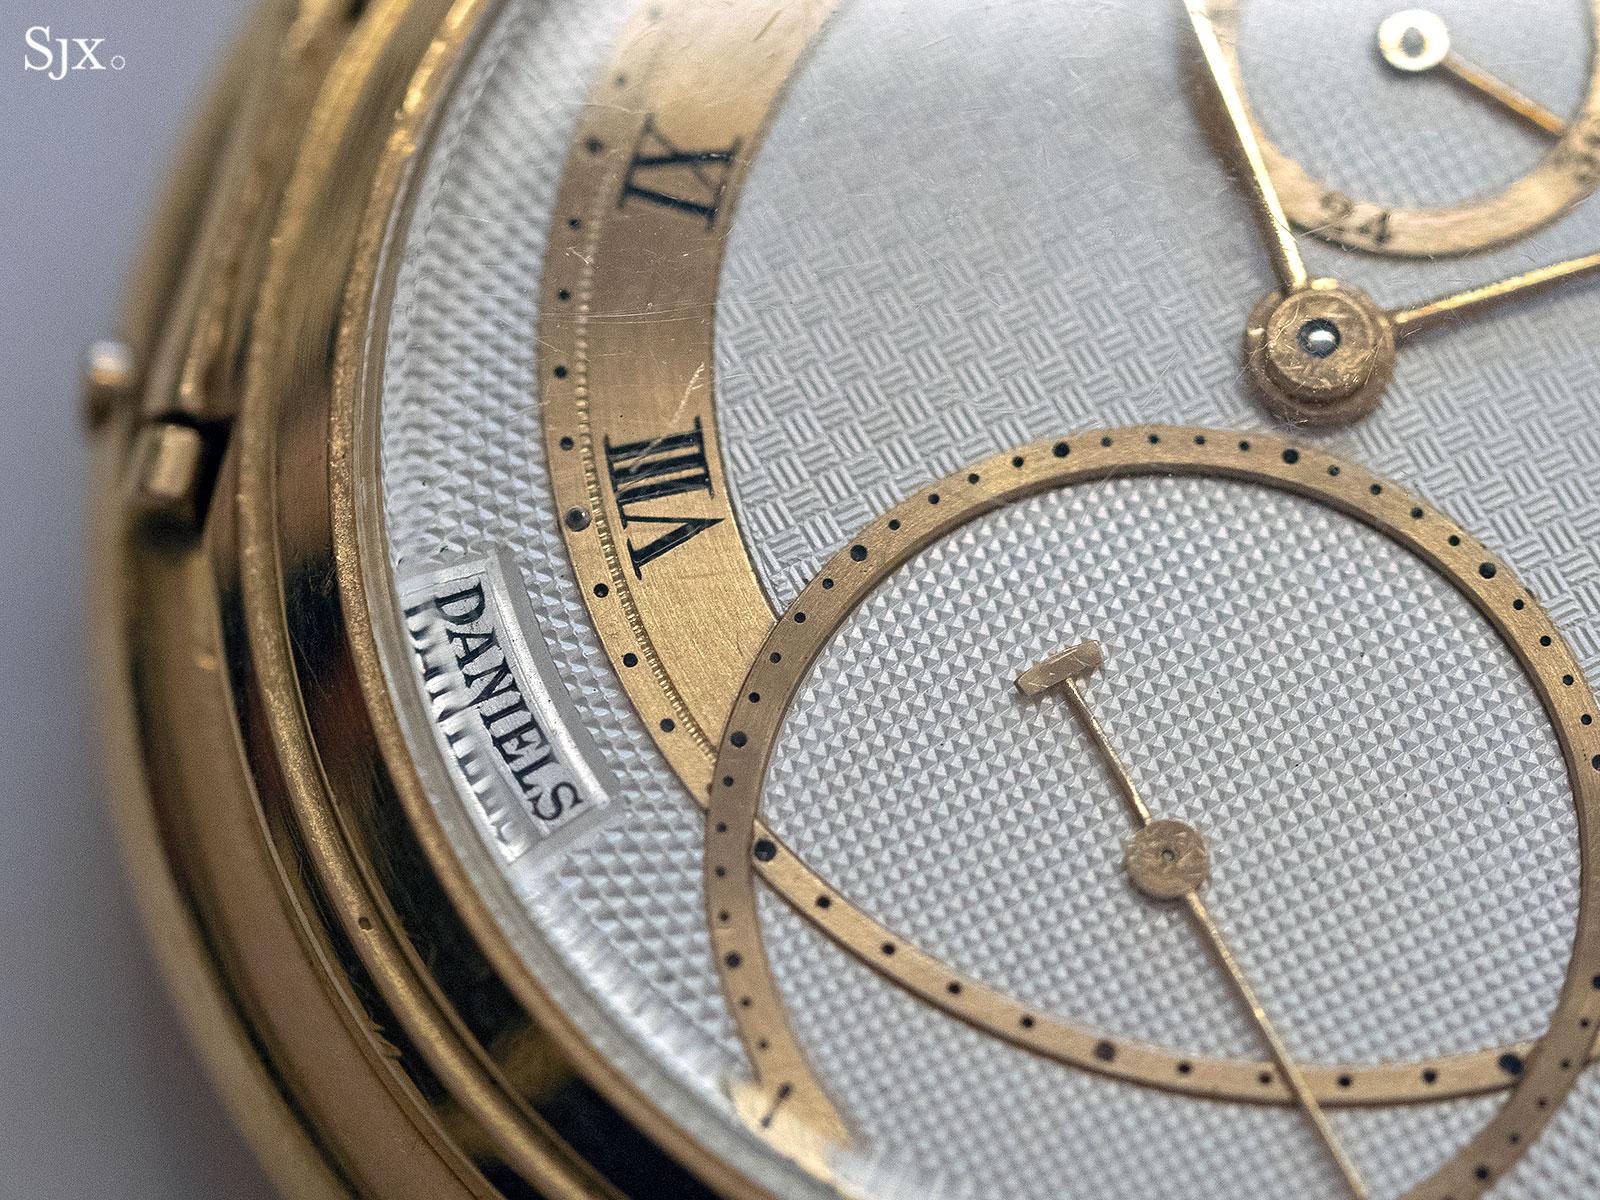 George Daniels Spring Case Tourbillon Wristwatch 7